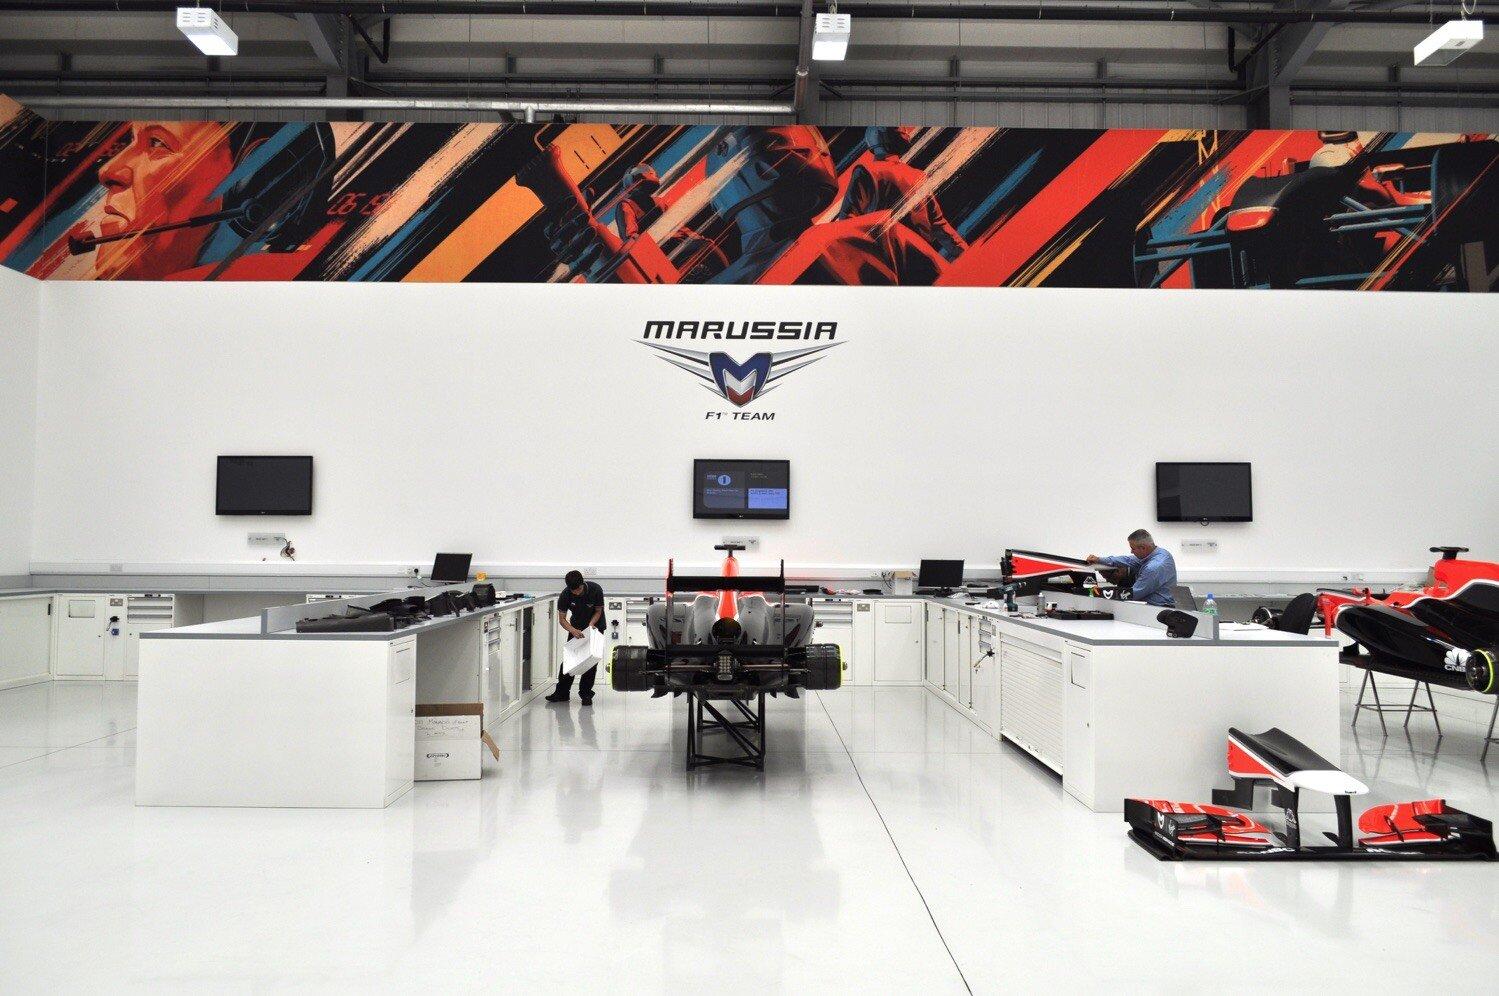 tavis-coburn-F1-team-graphic-illustration-marussia-33.jpg